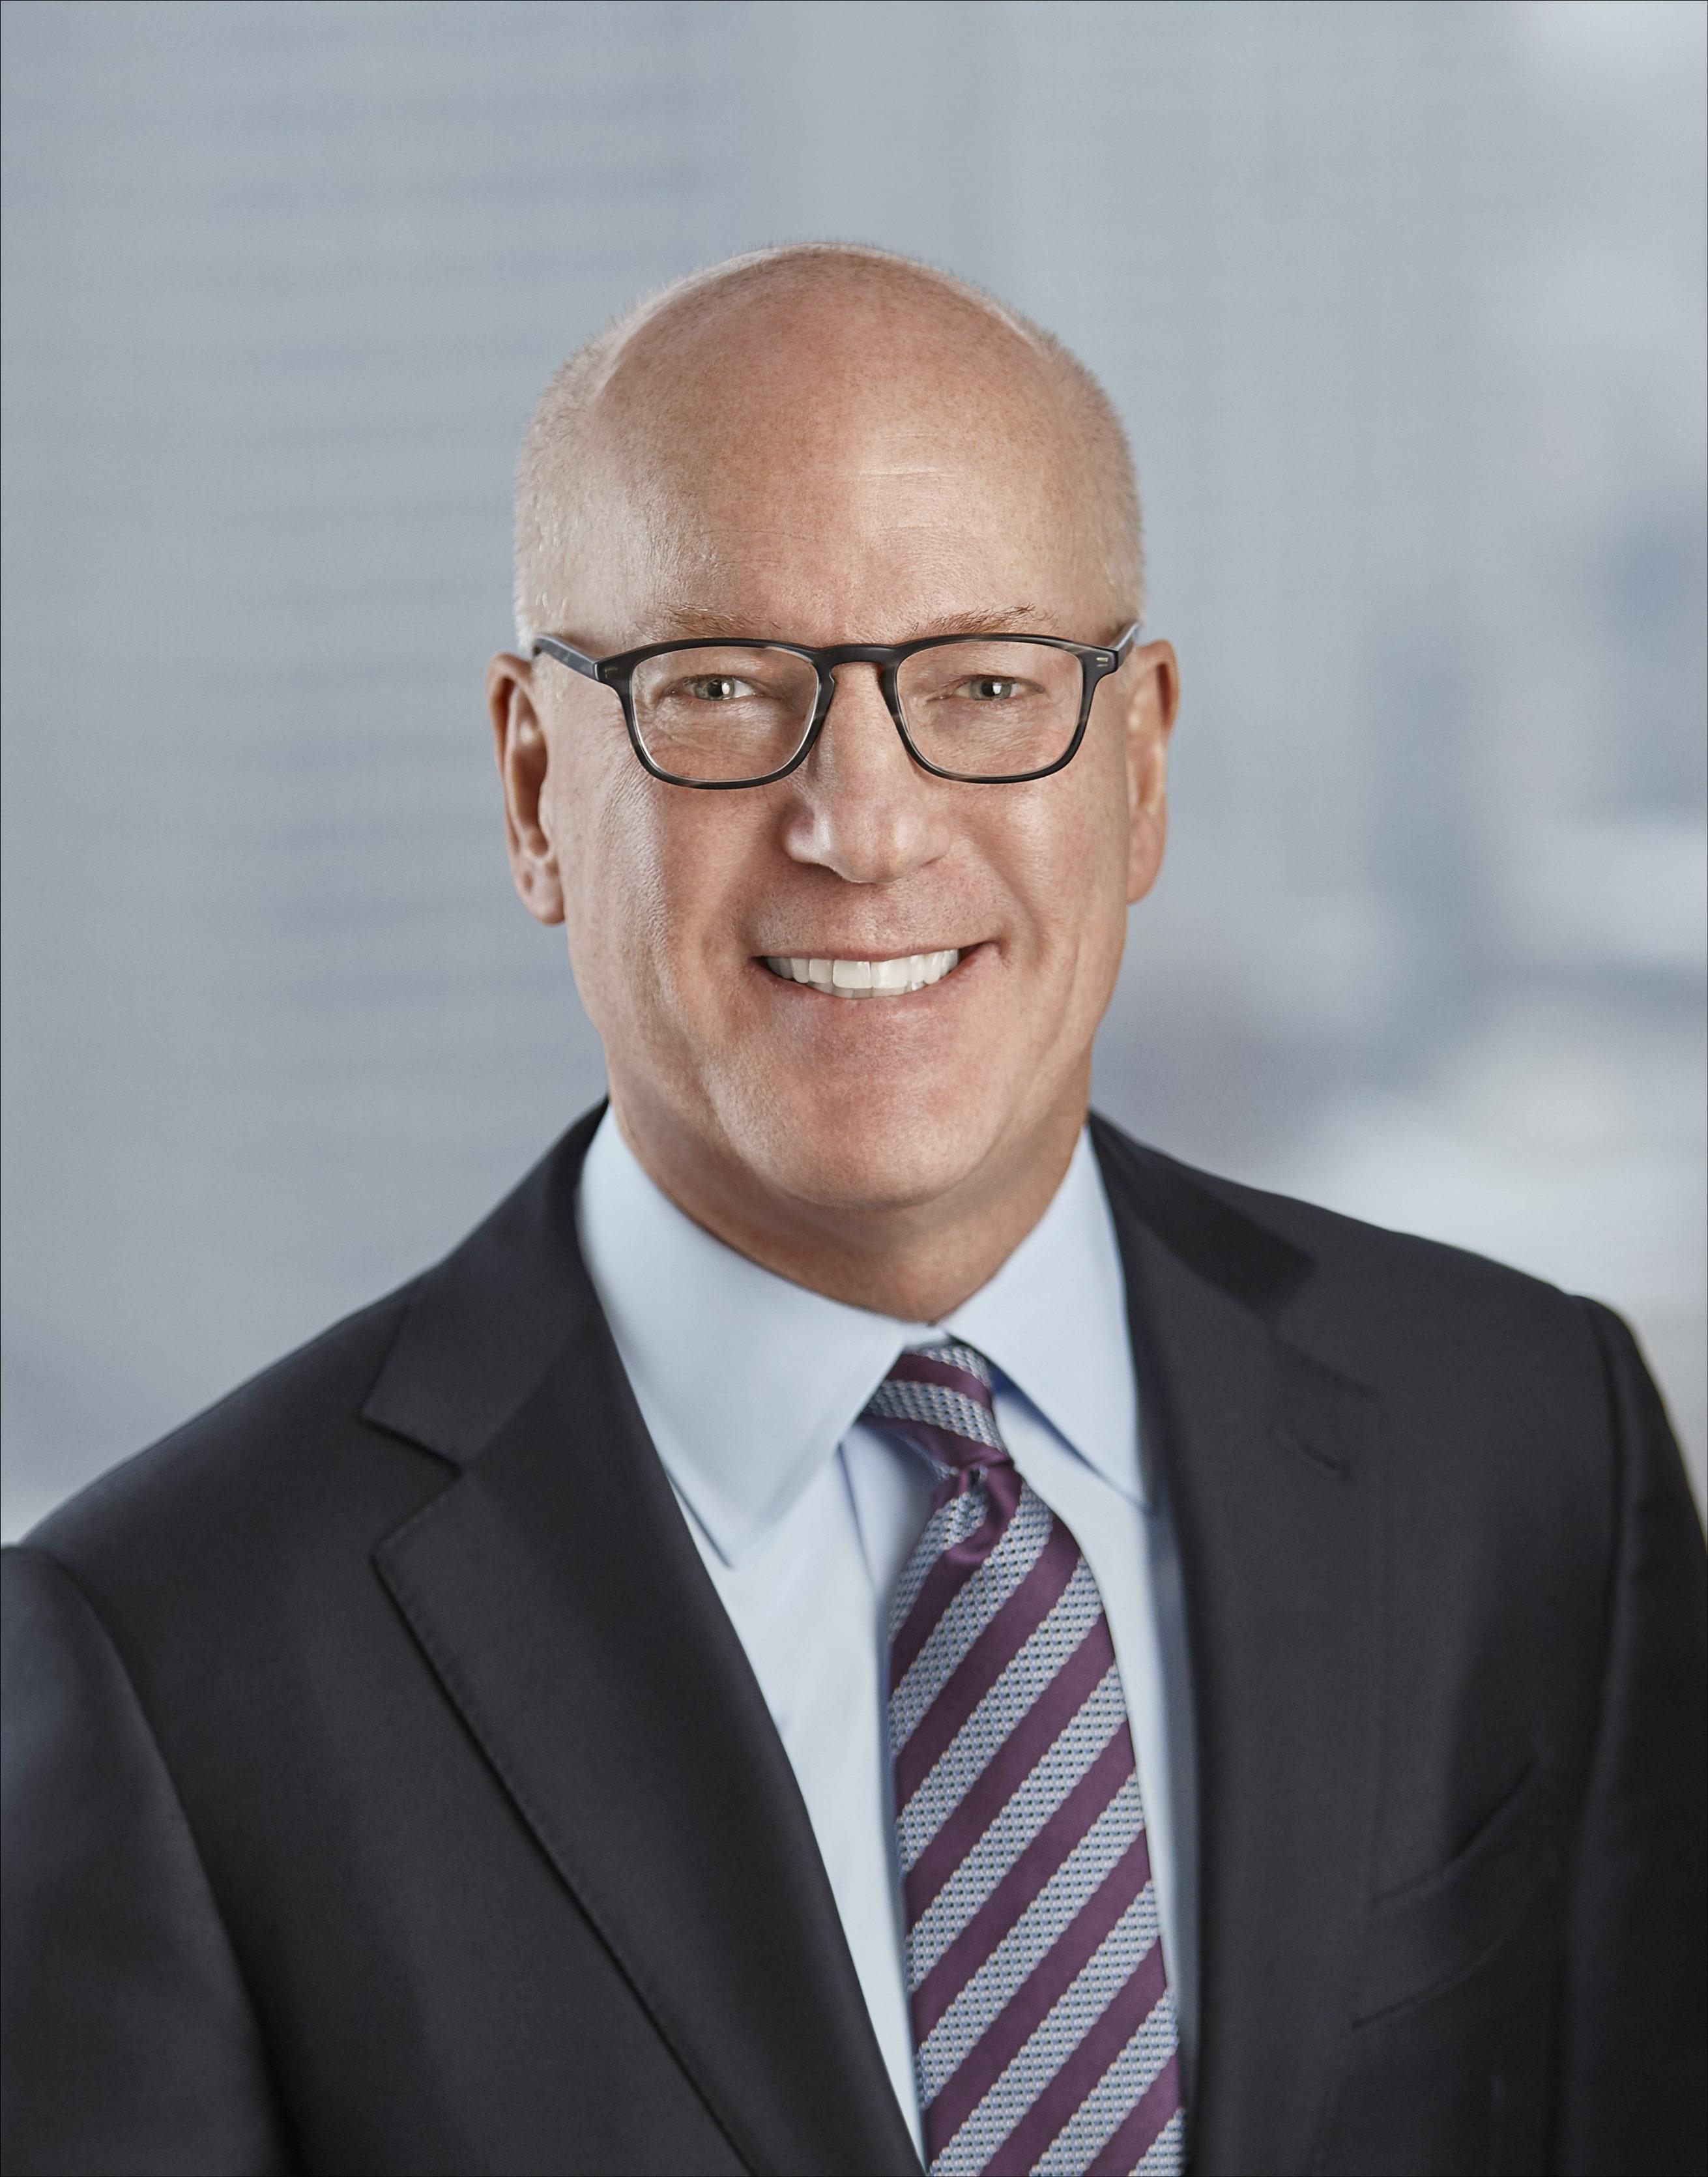 Daniel S. Glaser, Marsh & McLennan Companies